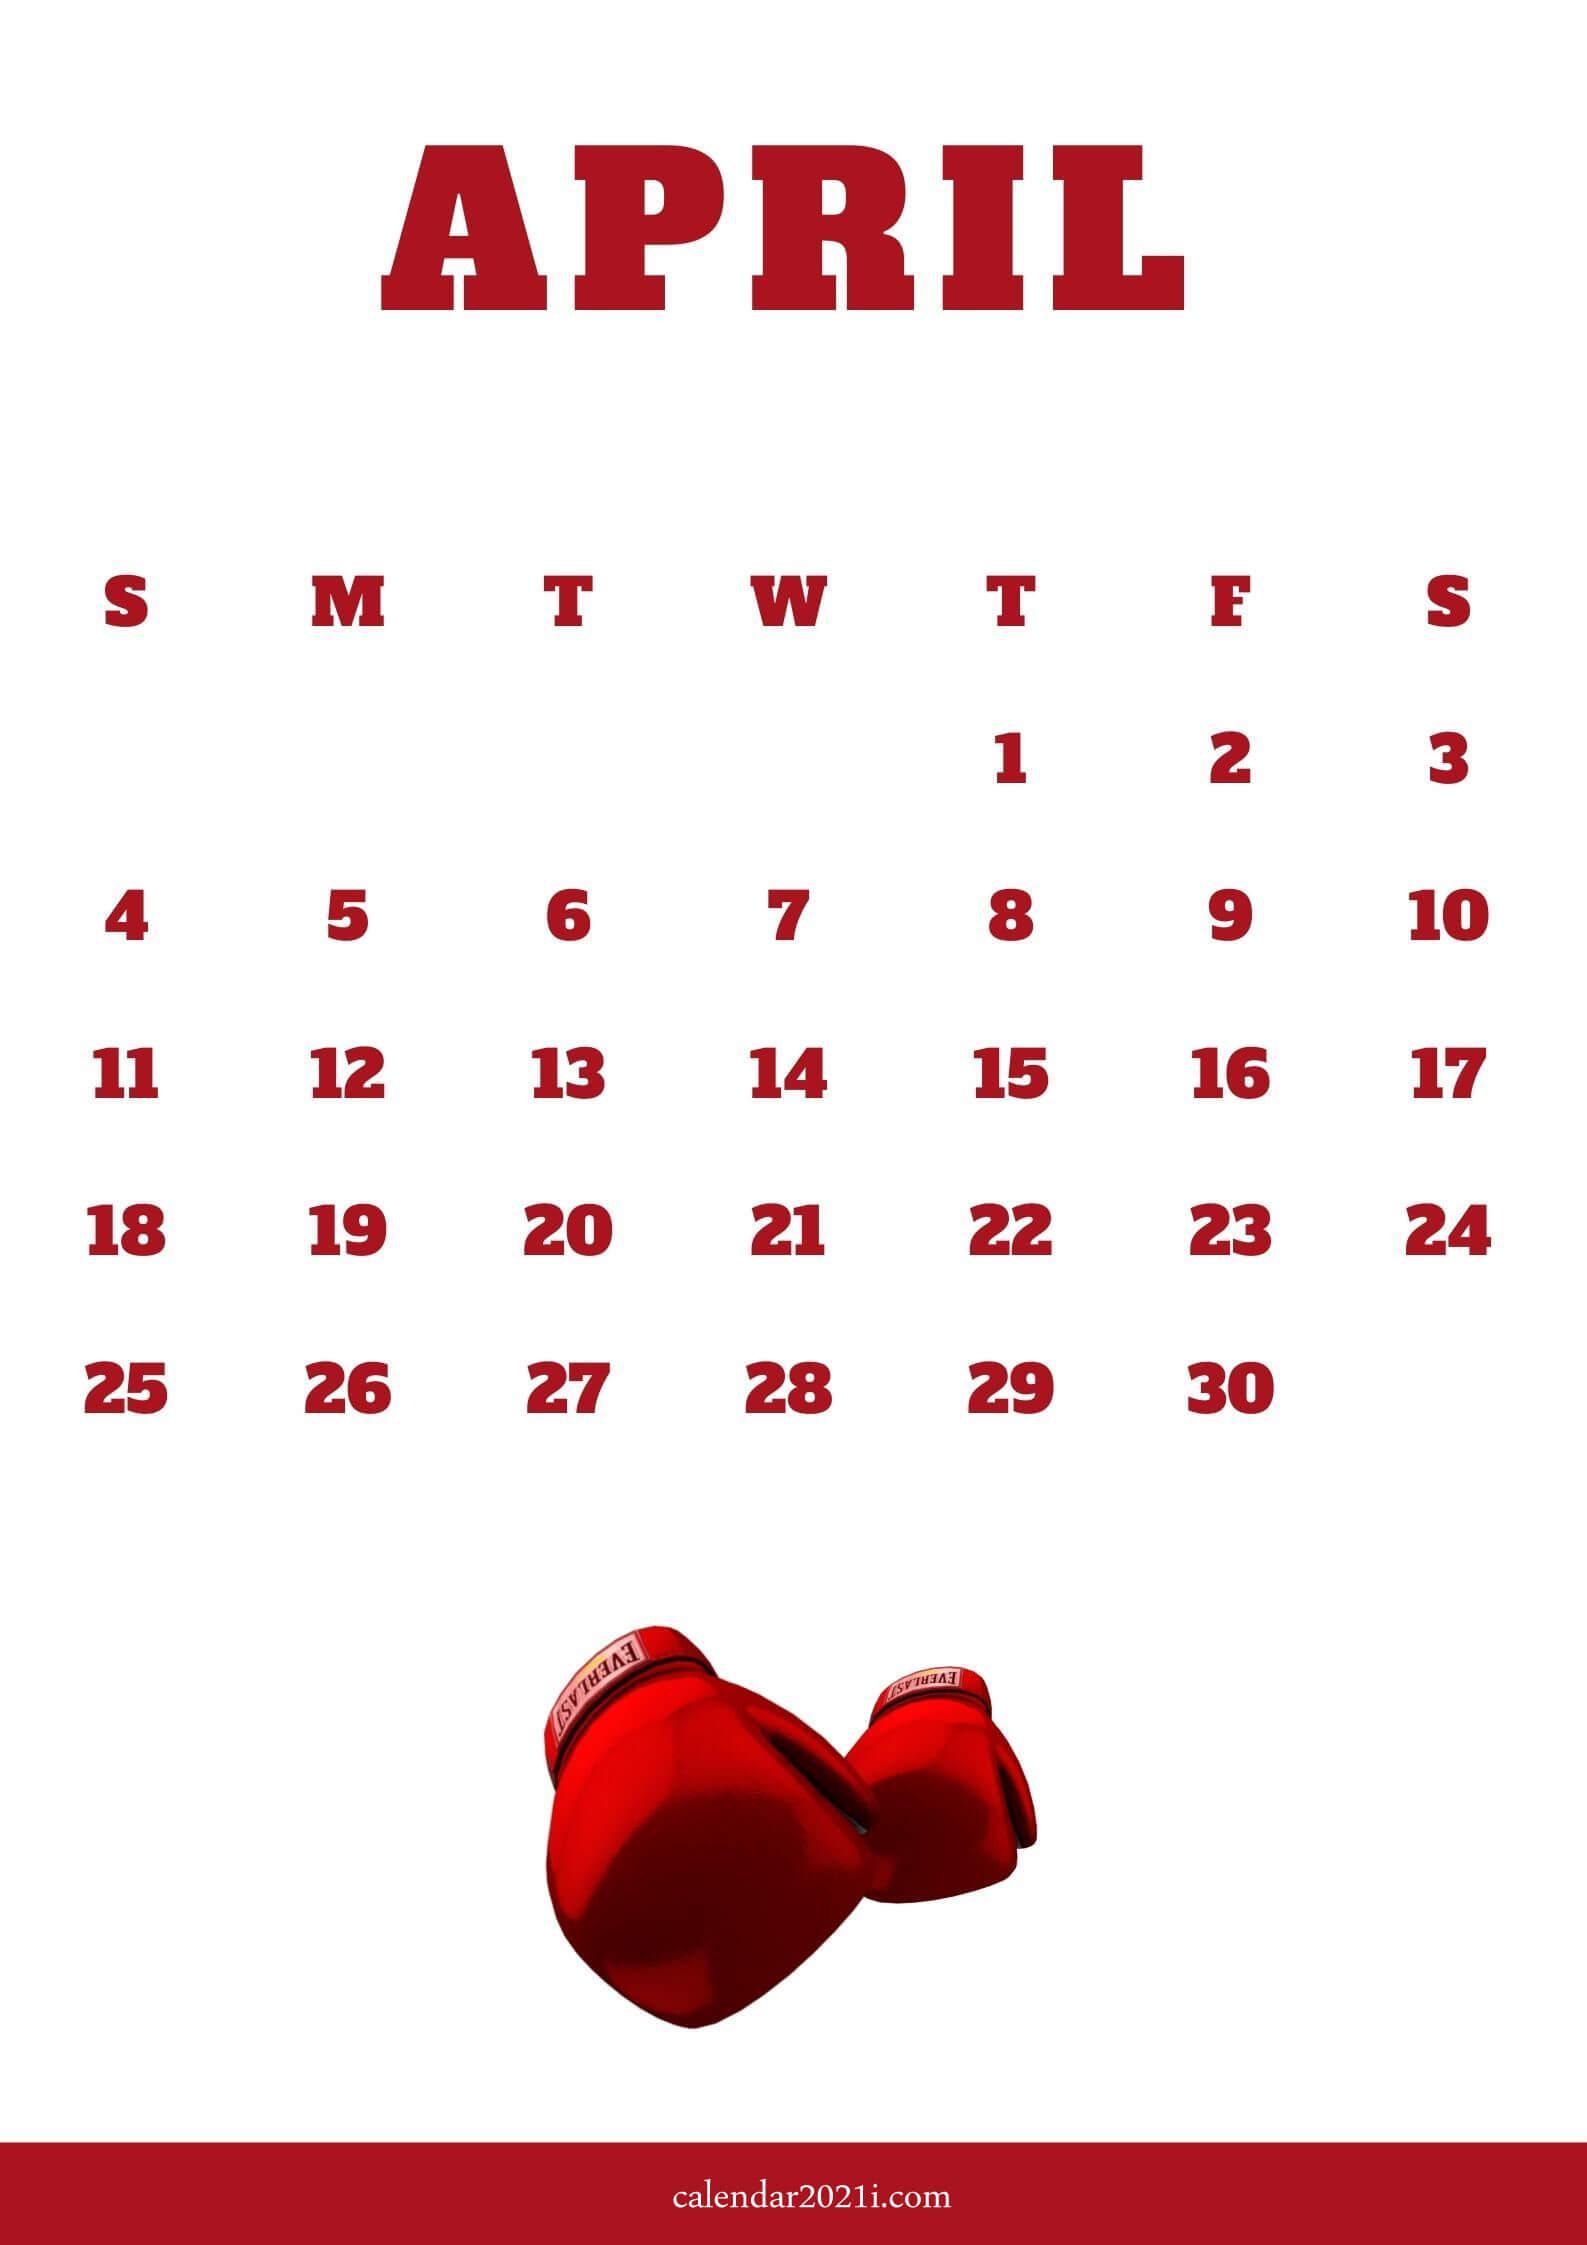 April 2021 iPhone Screensaver Calendar